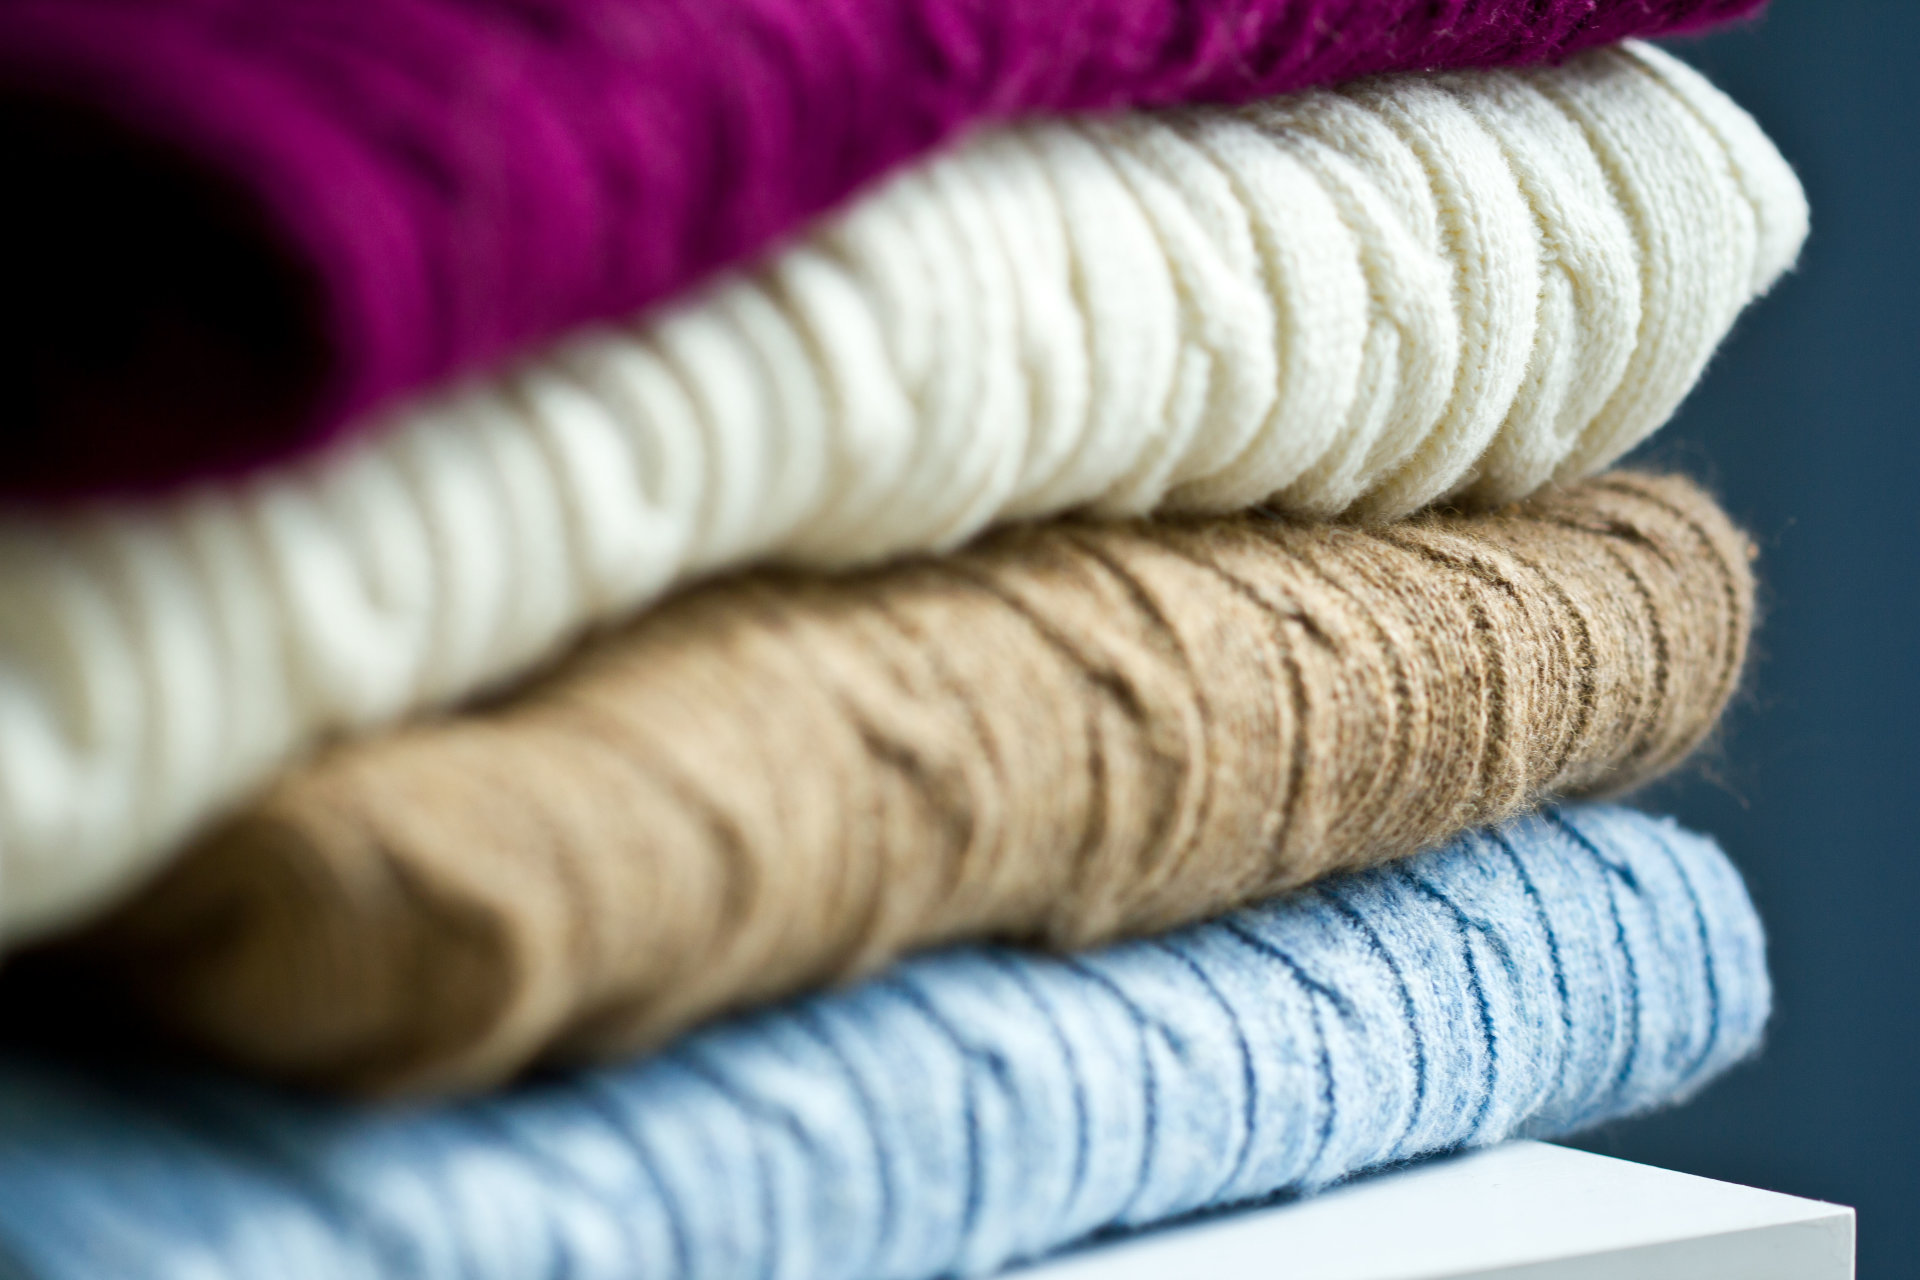 Kašmyro vilnos megztiniai